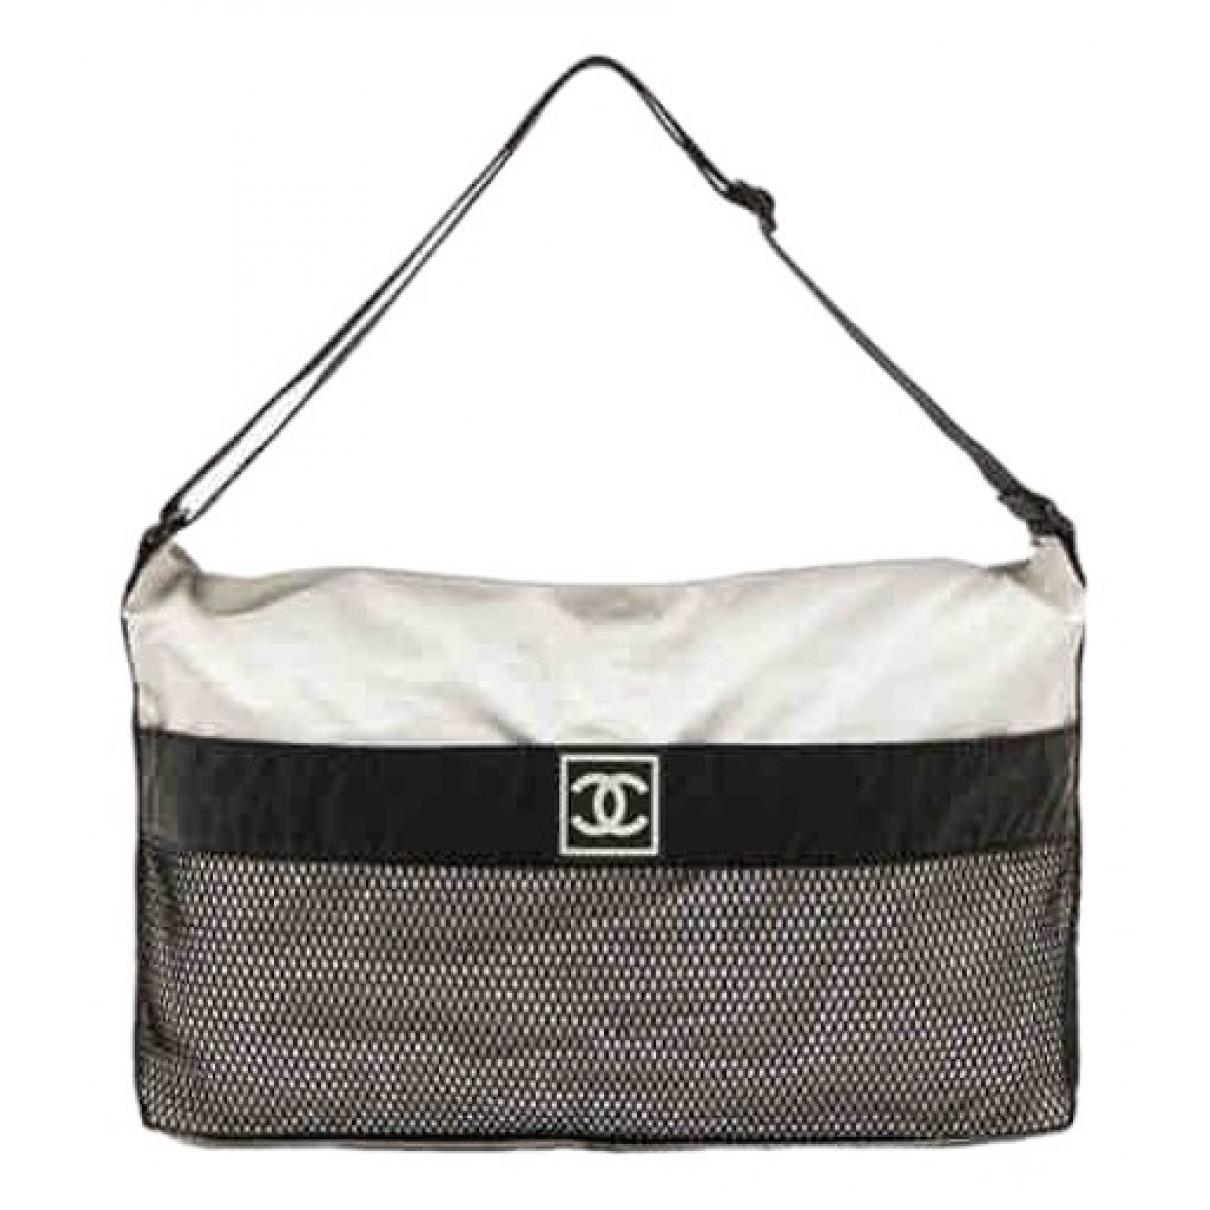 Chanel \N Beige Travel bag for Women \N